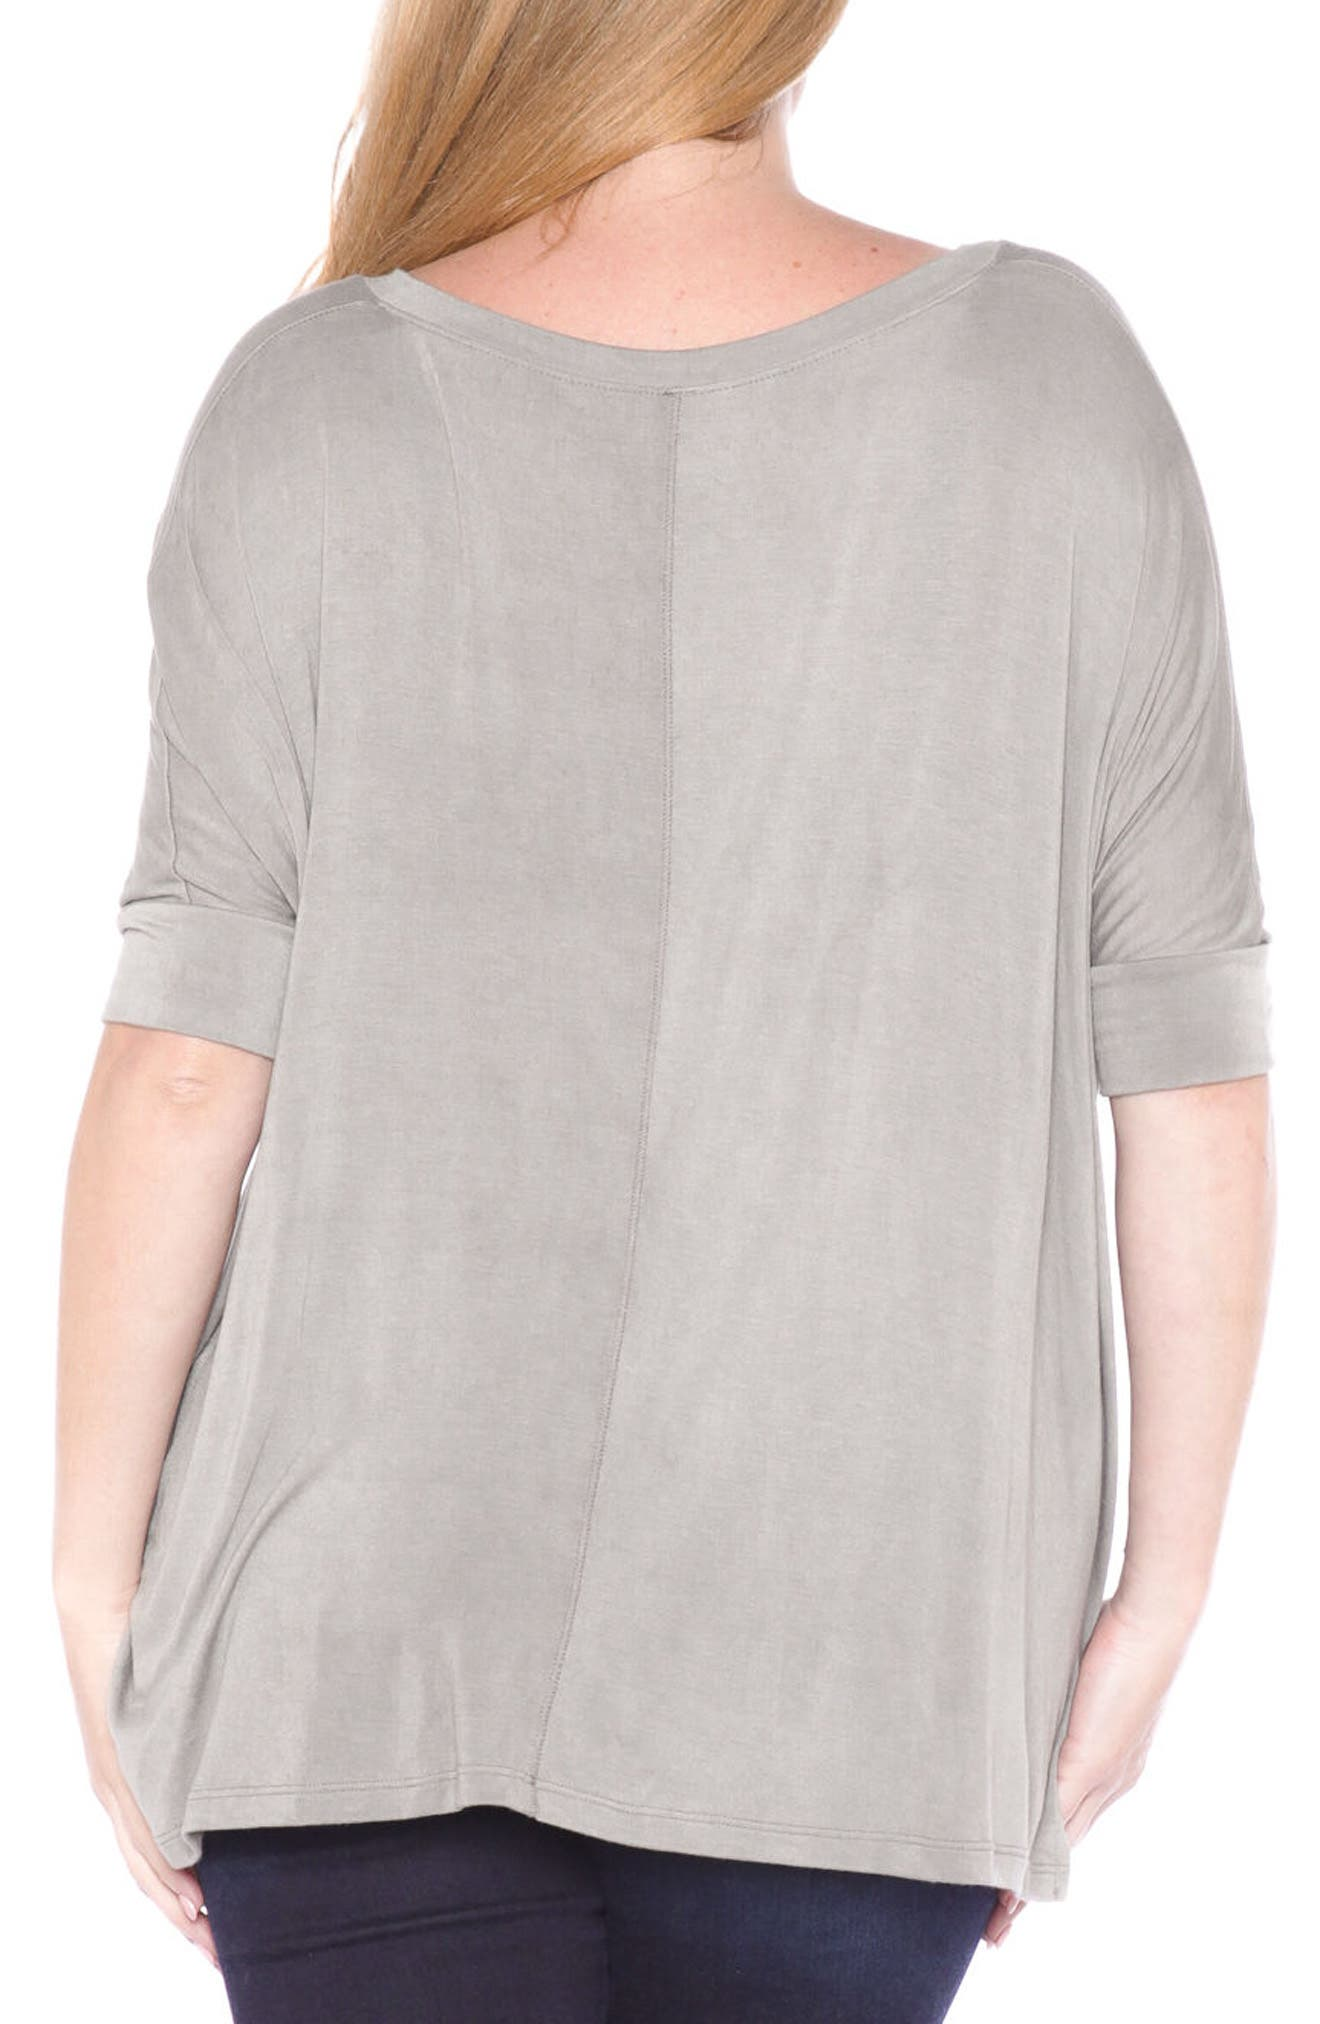 Alternate Image 2  - SLINK Jeans Dolman Sleeve Top (Plus Size)